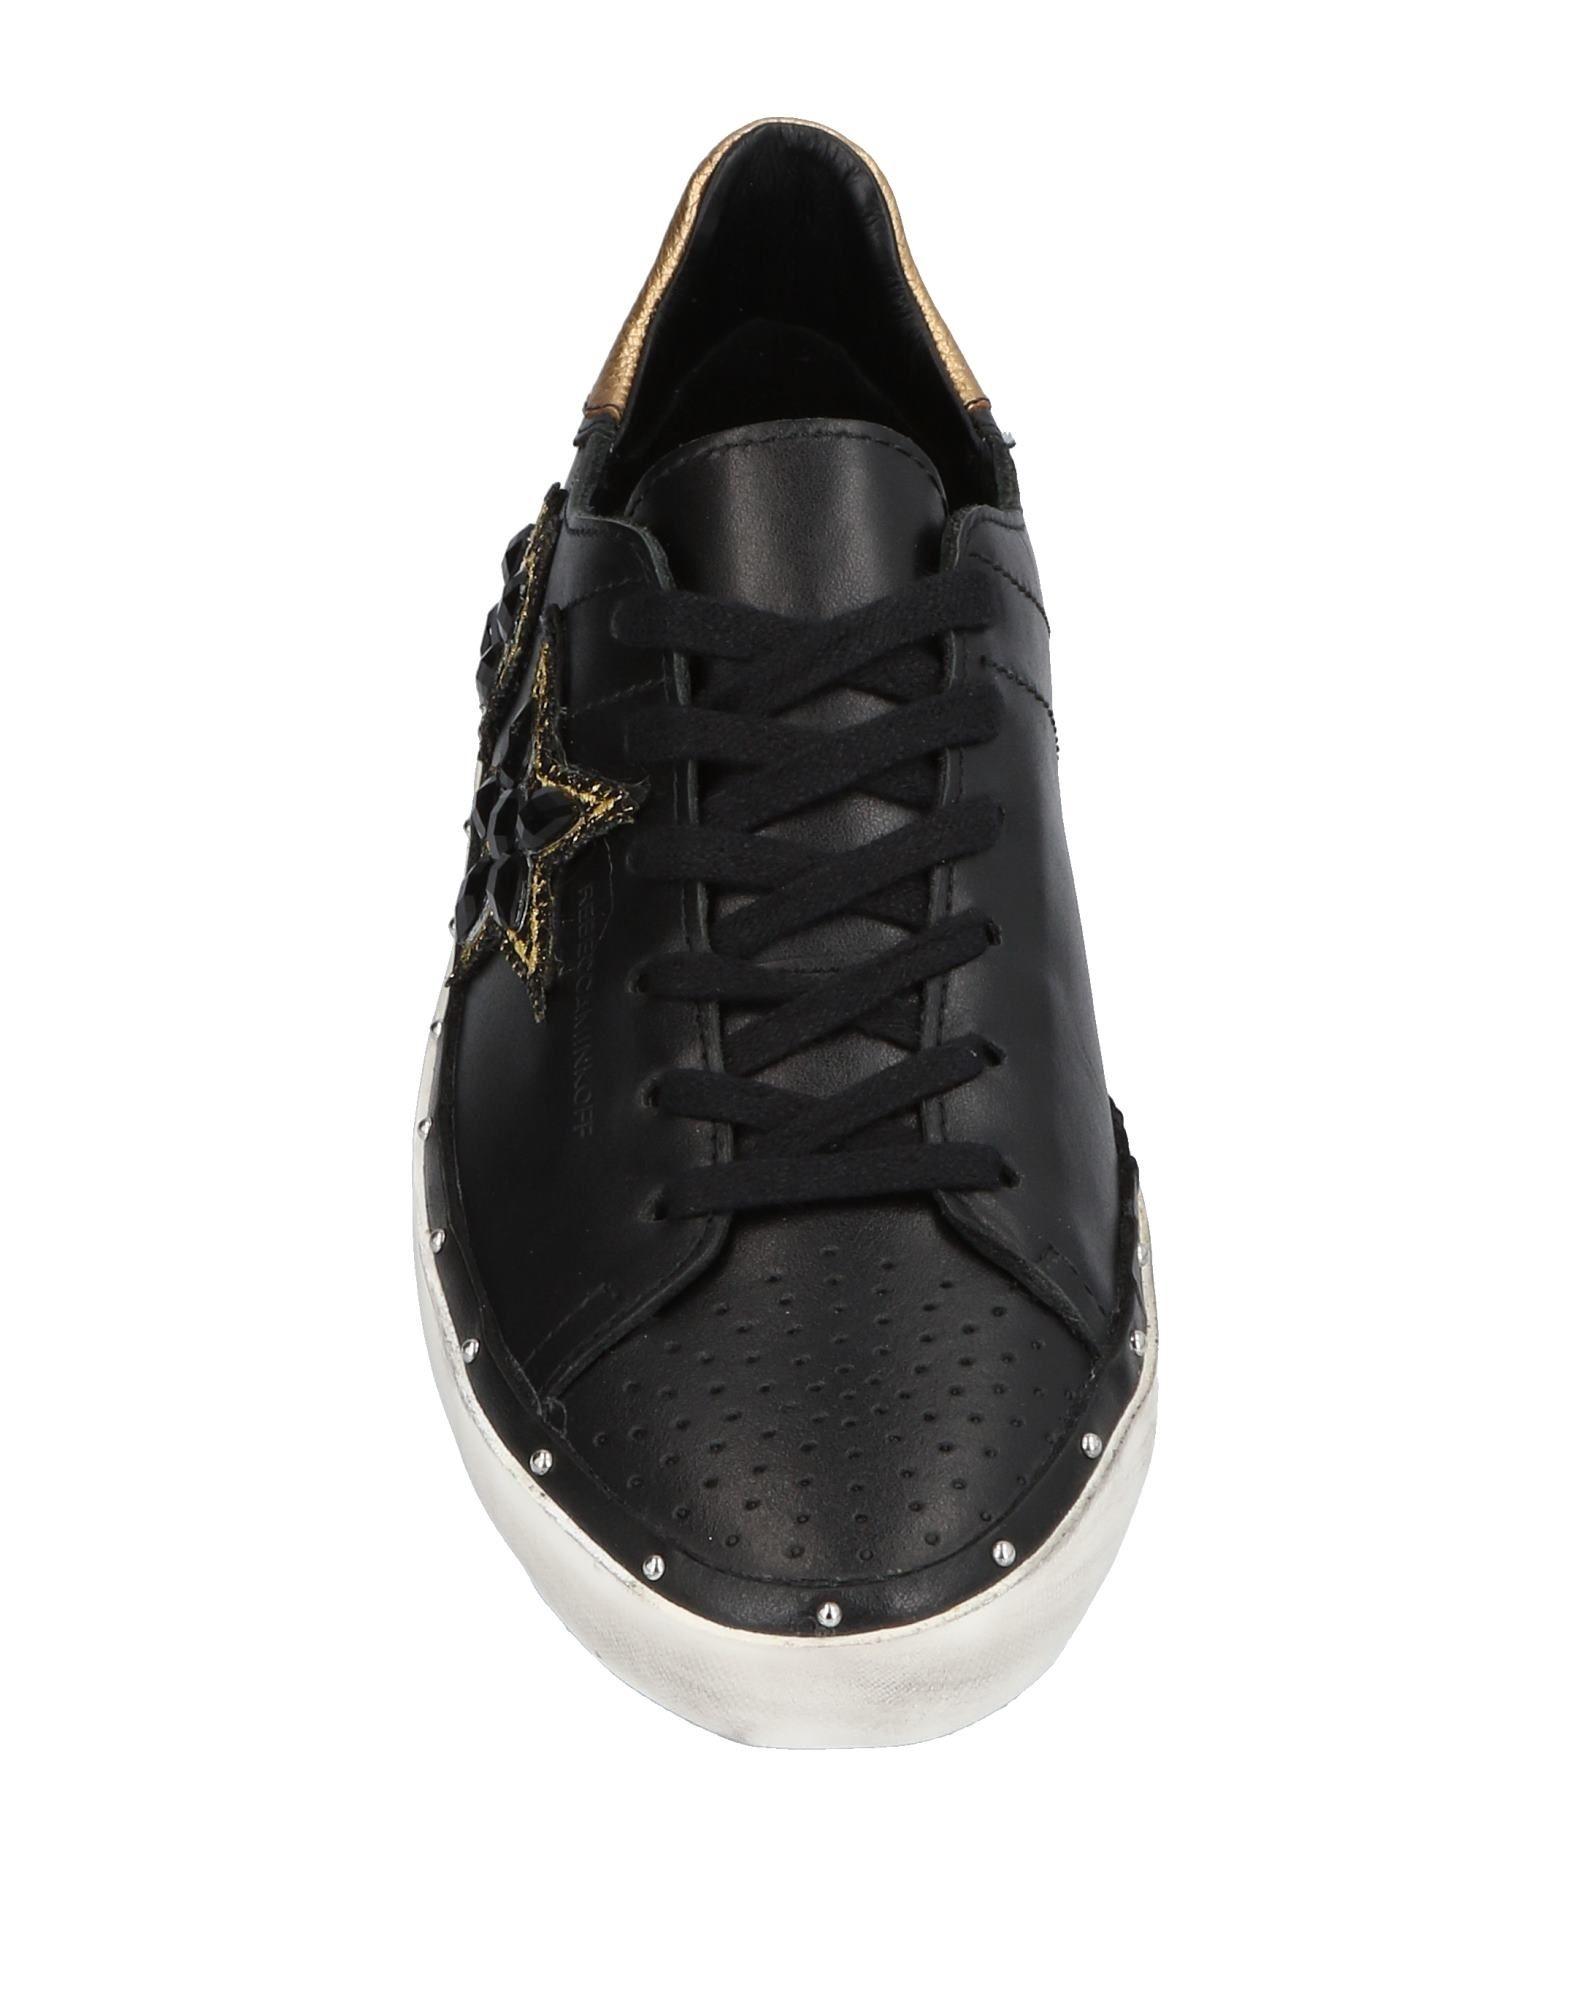 Sneakers Rebecca Minkoff Femme - Sneakers Rebecca Minkoff sur